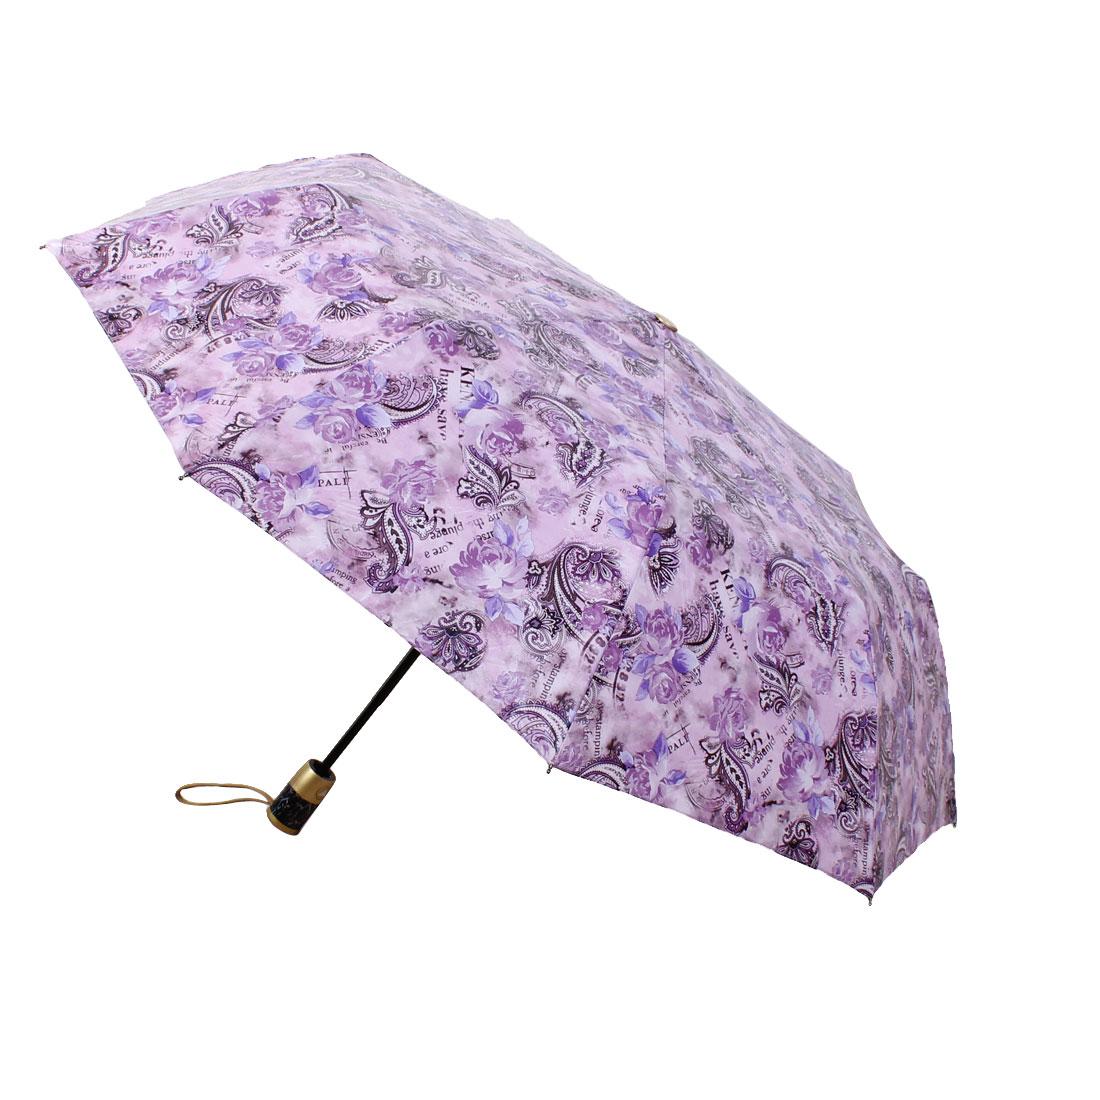 Automatic Open Close Folding Compact Rain Umbrella Purple